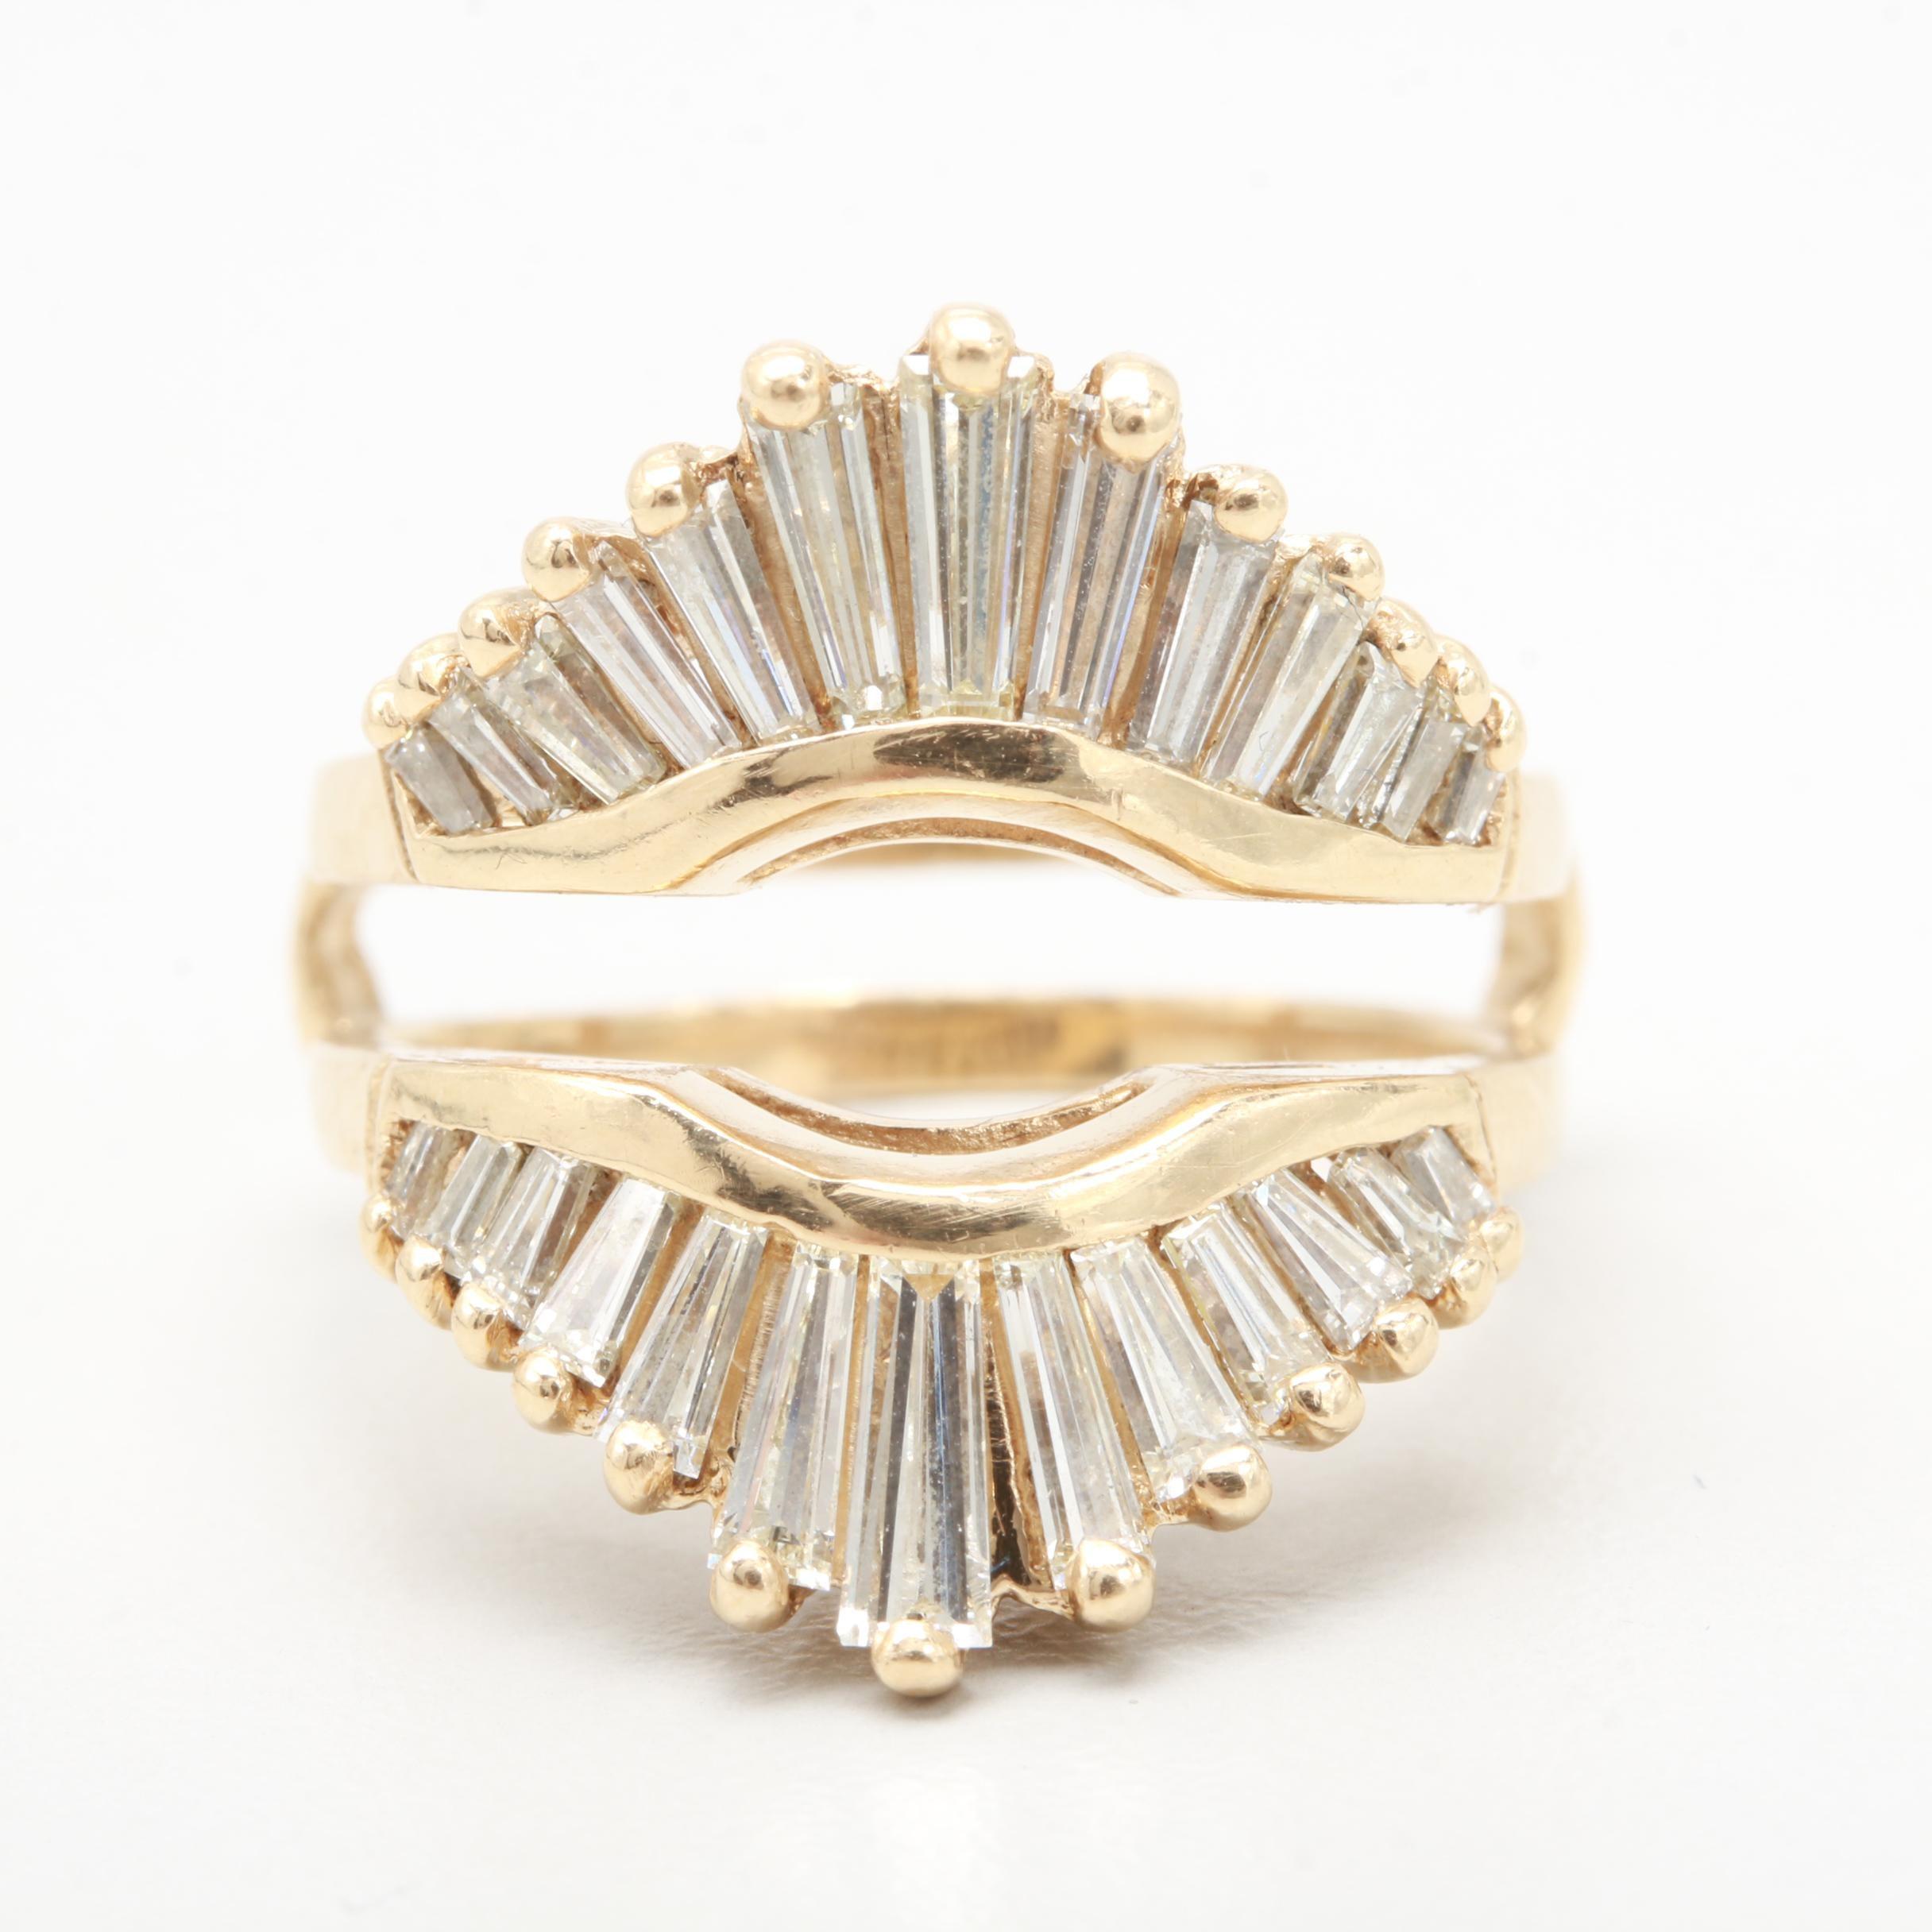 14K Yellow Gold 2.00 CTW Diamond Ring Guard